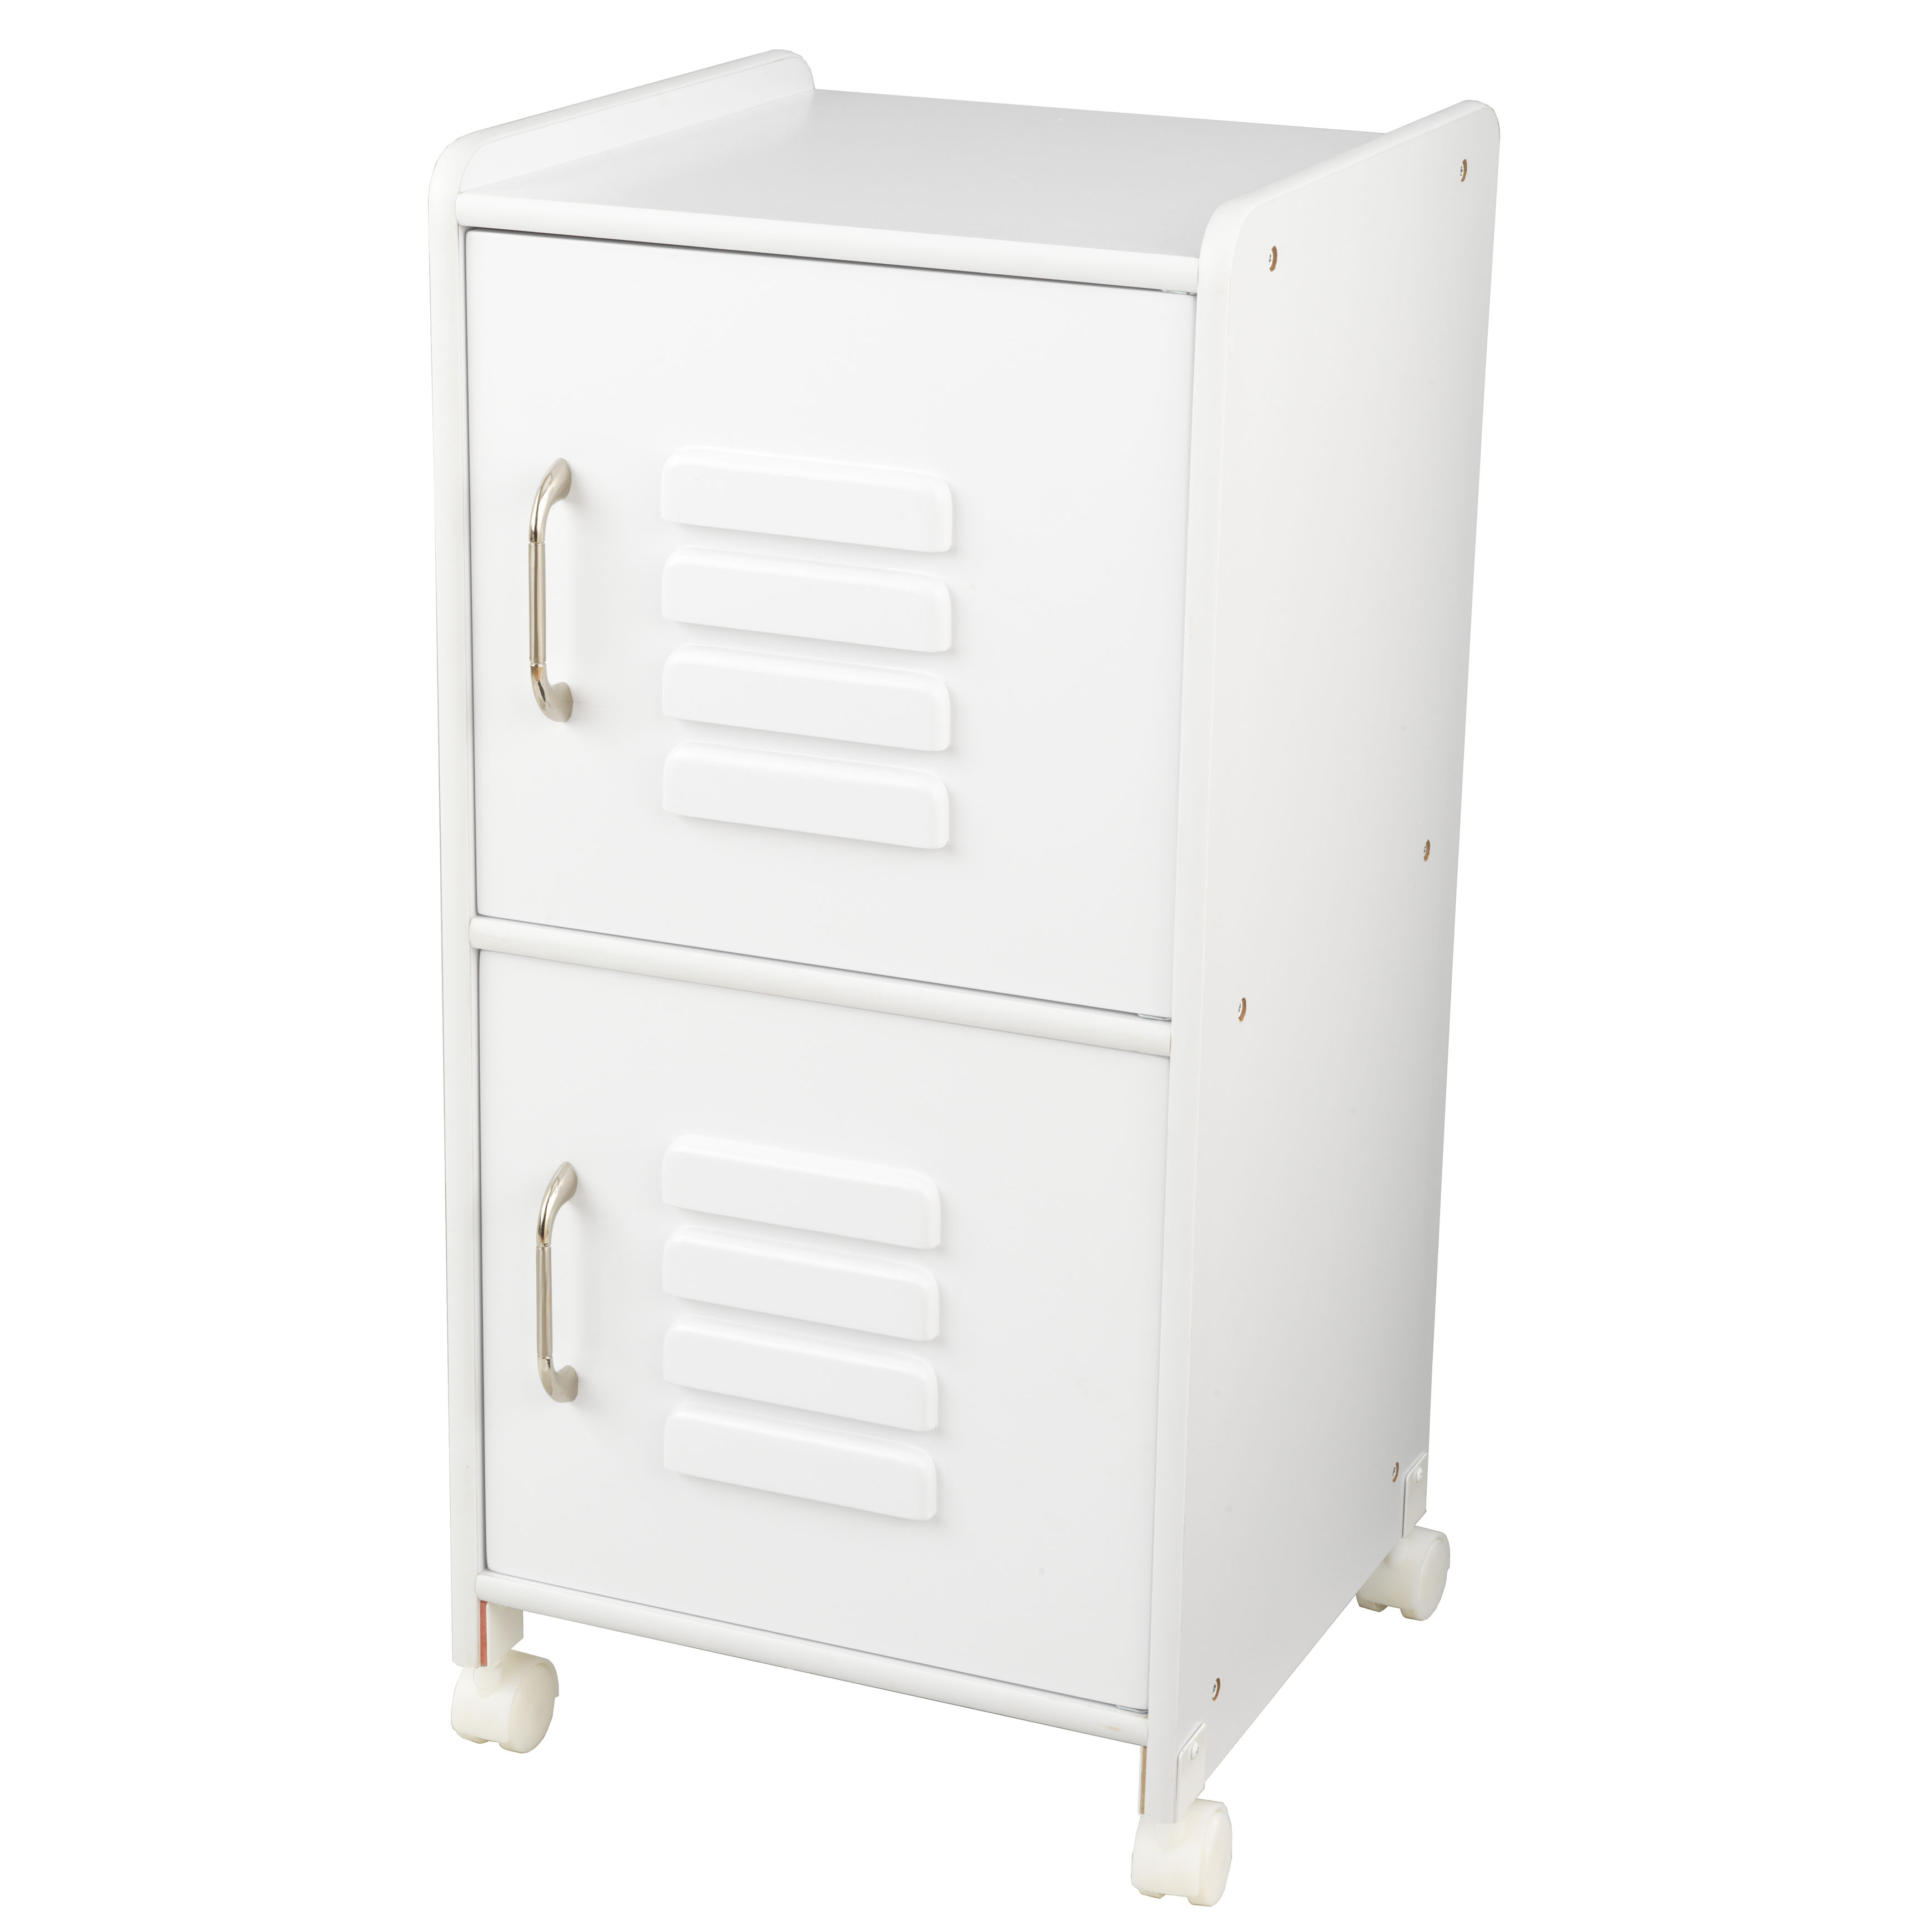 KidKraft Medium Locker - White